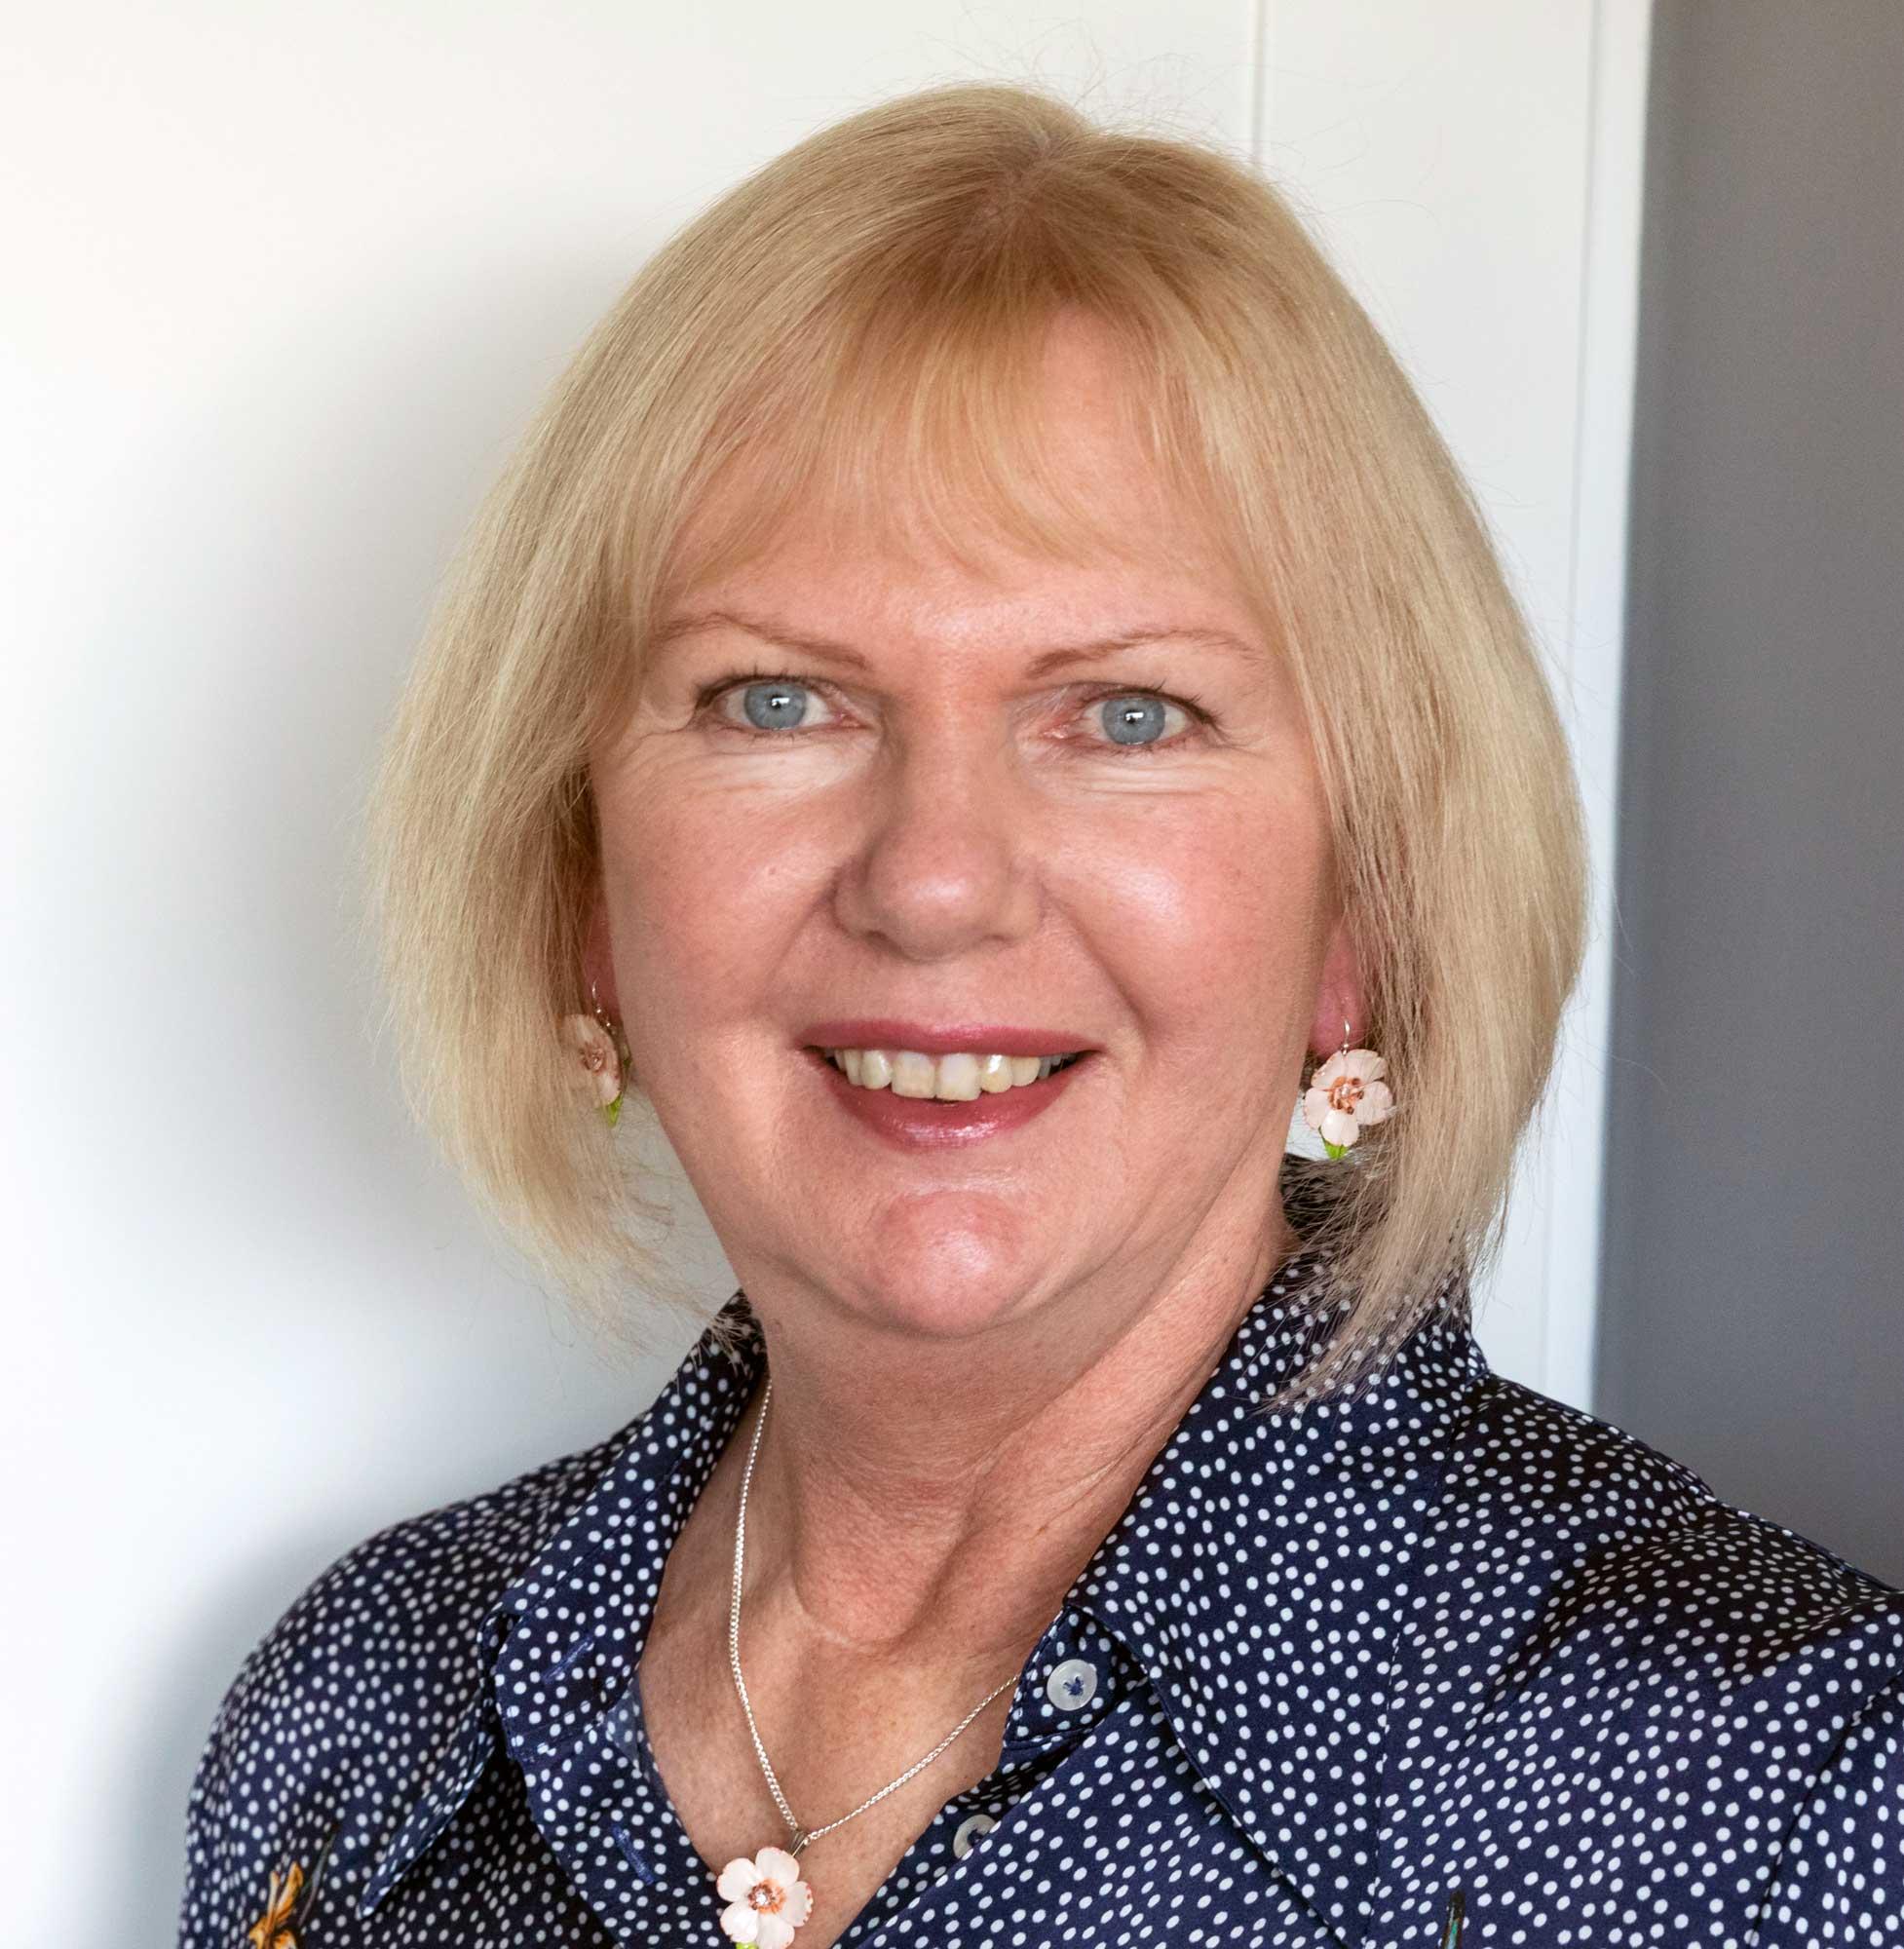 Rachel Mullett of Pembrokeshire Moments